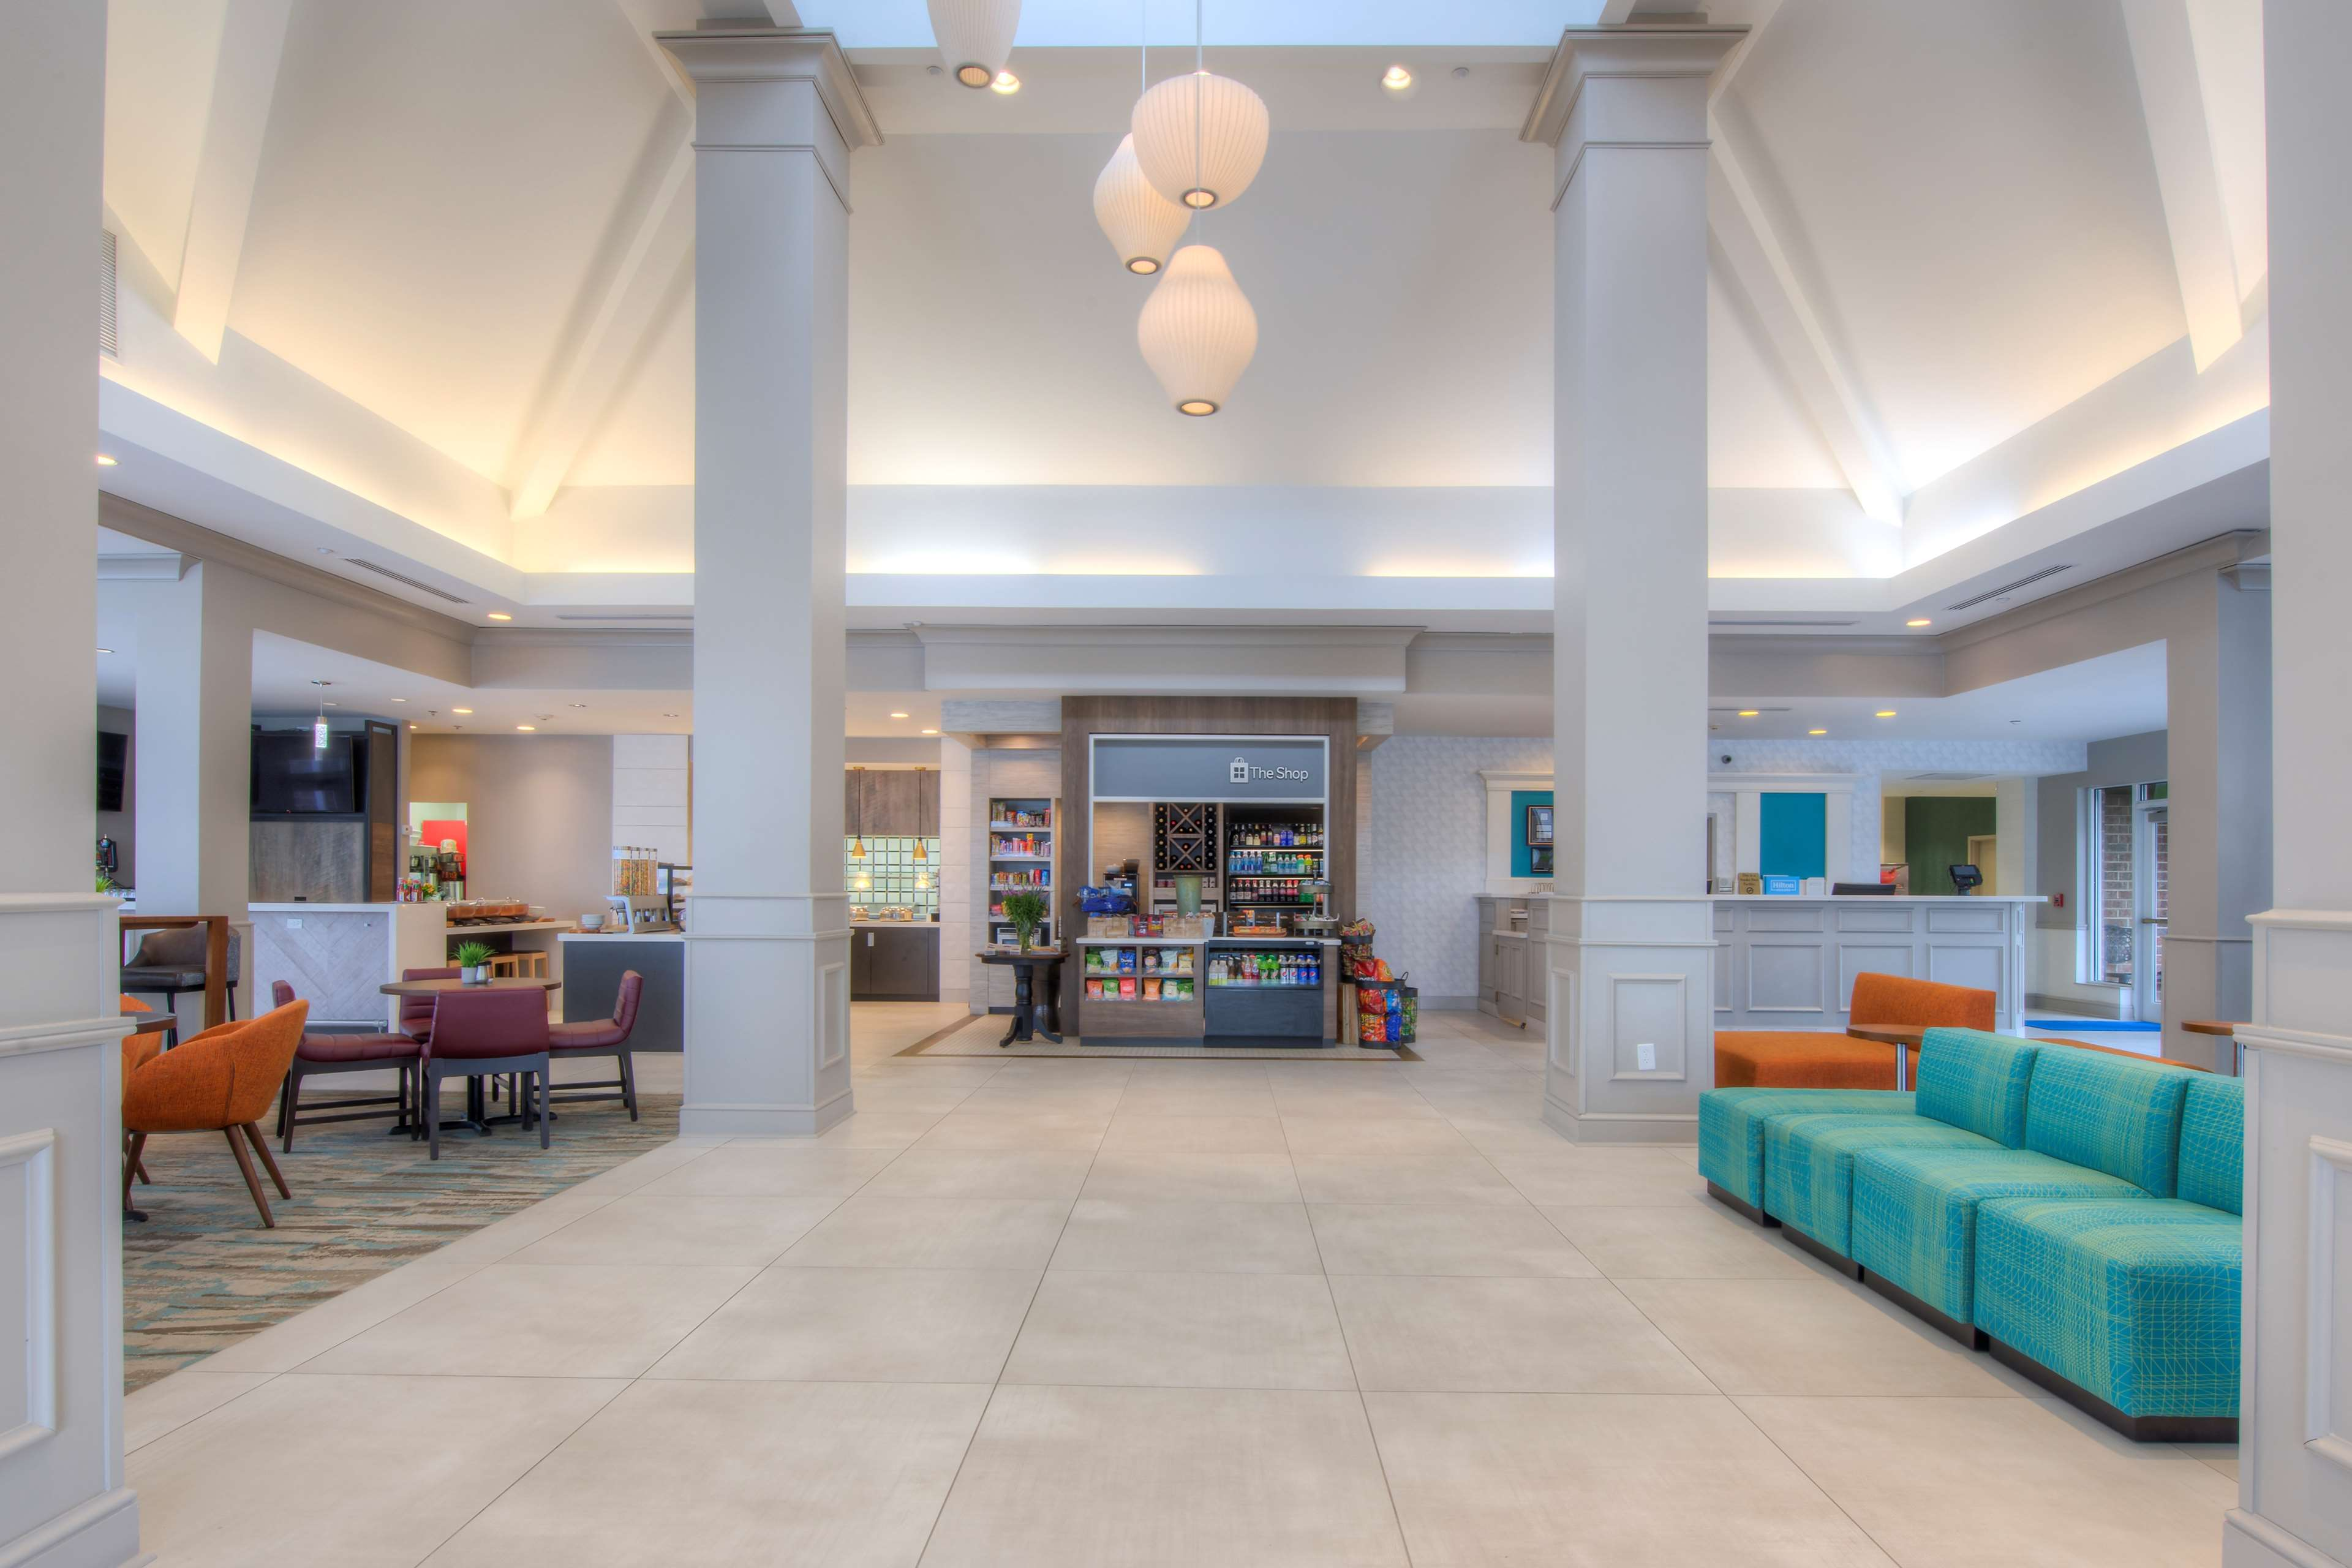 Hilton Garden Inn Durham Southpoint image 9